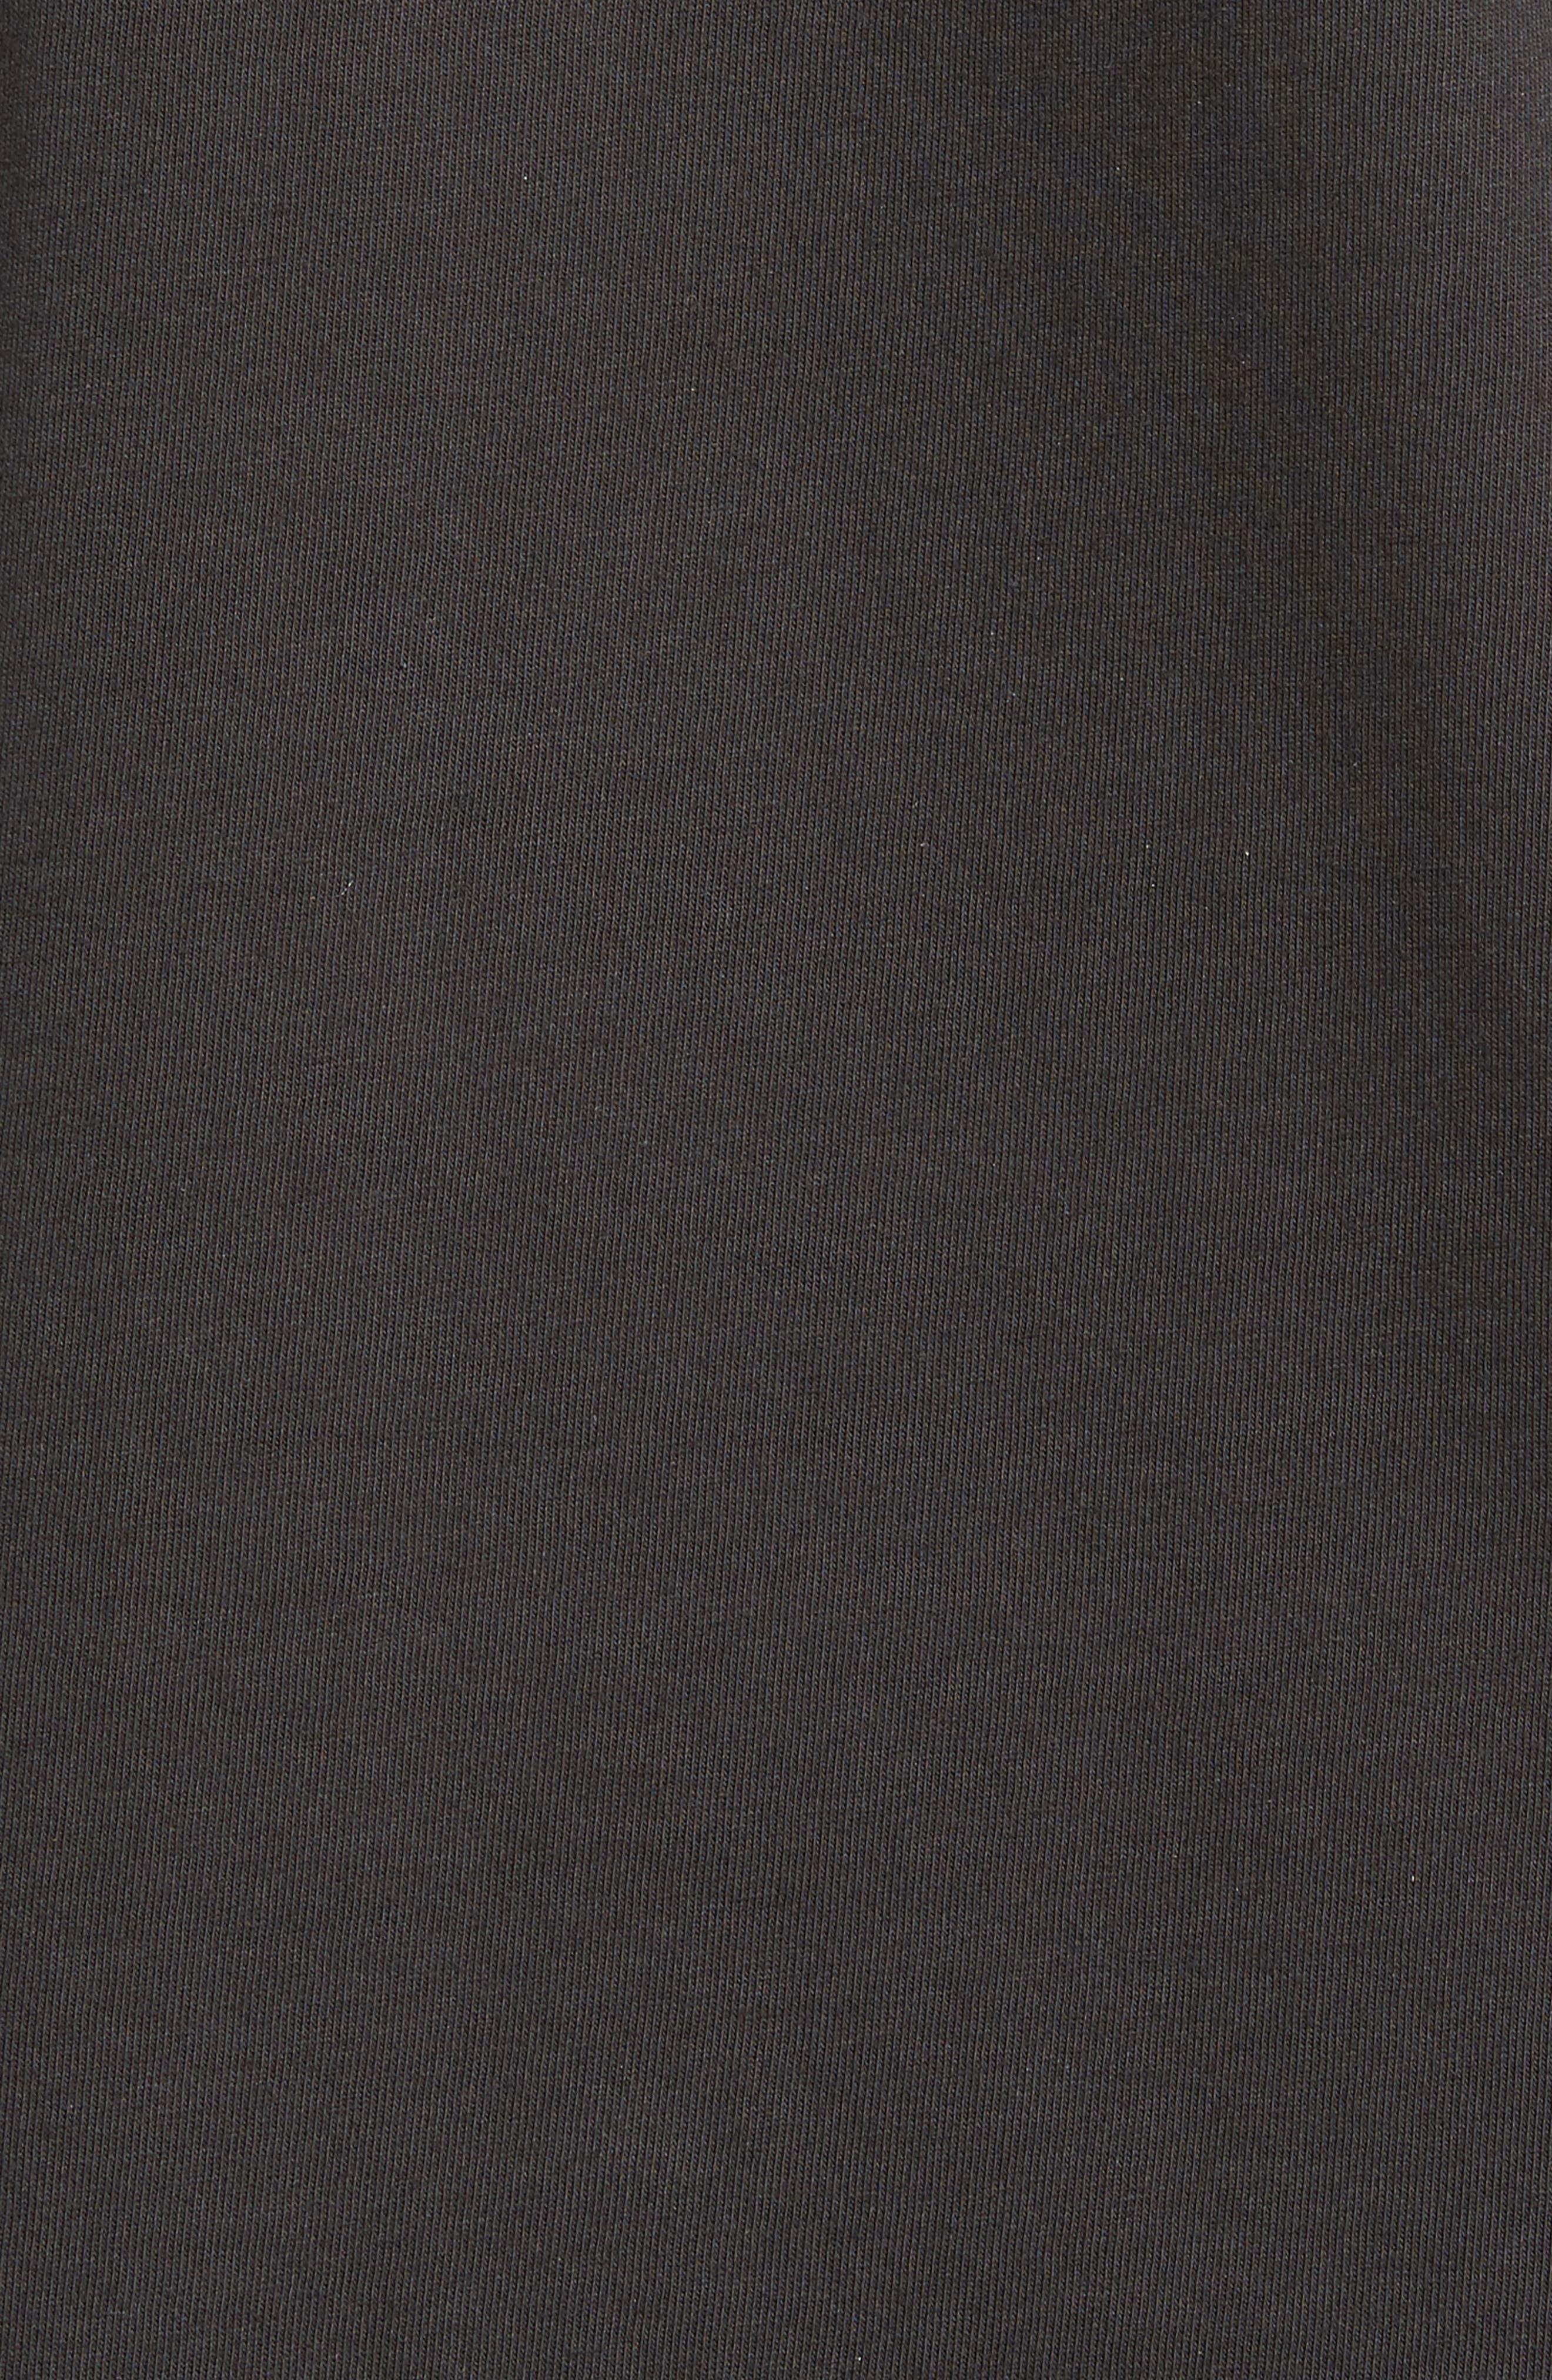 Gulp Fiction T-Shirt,                             Alternate thumbnail 5, color,                             001